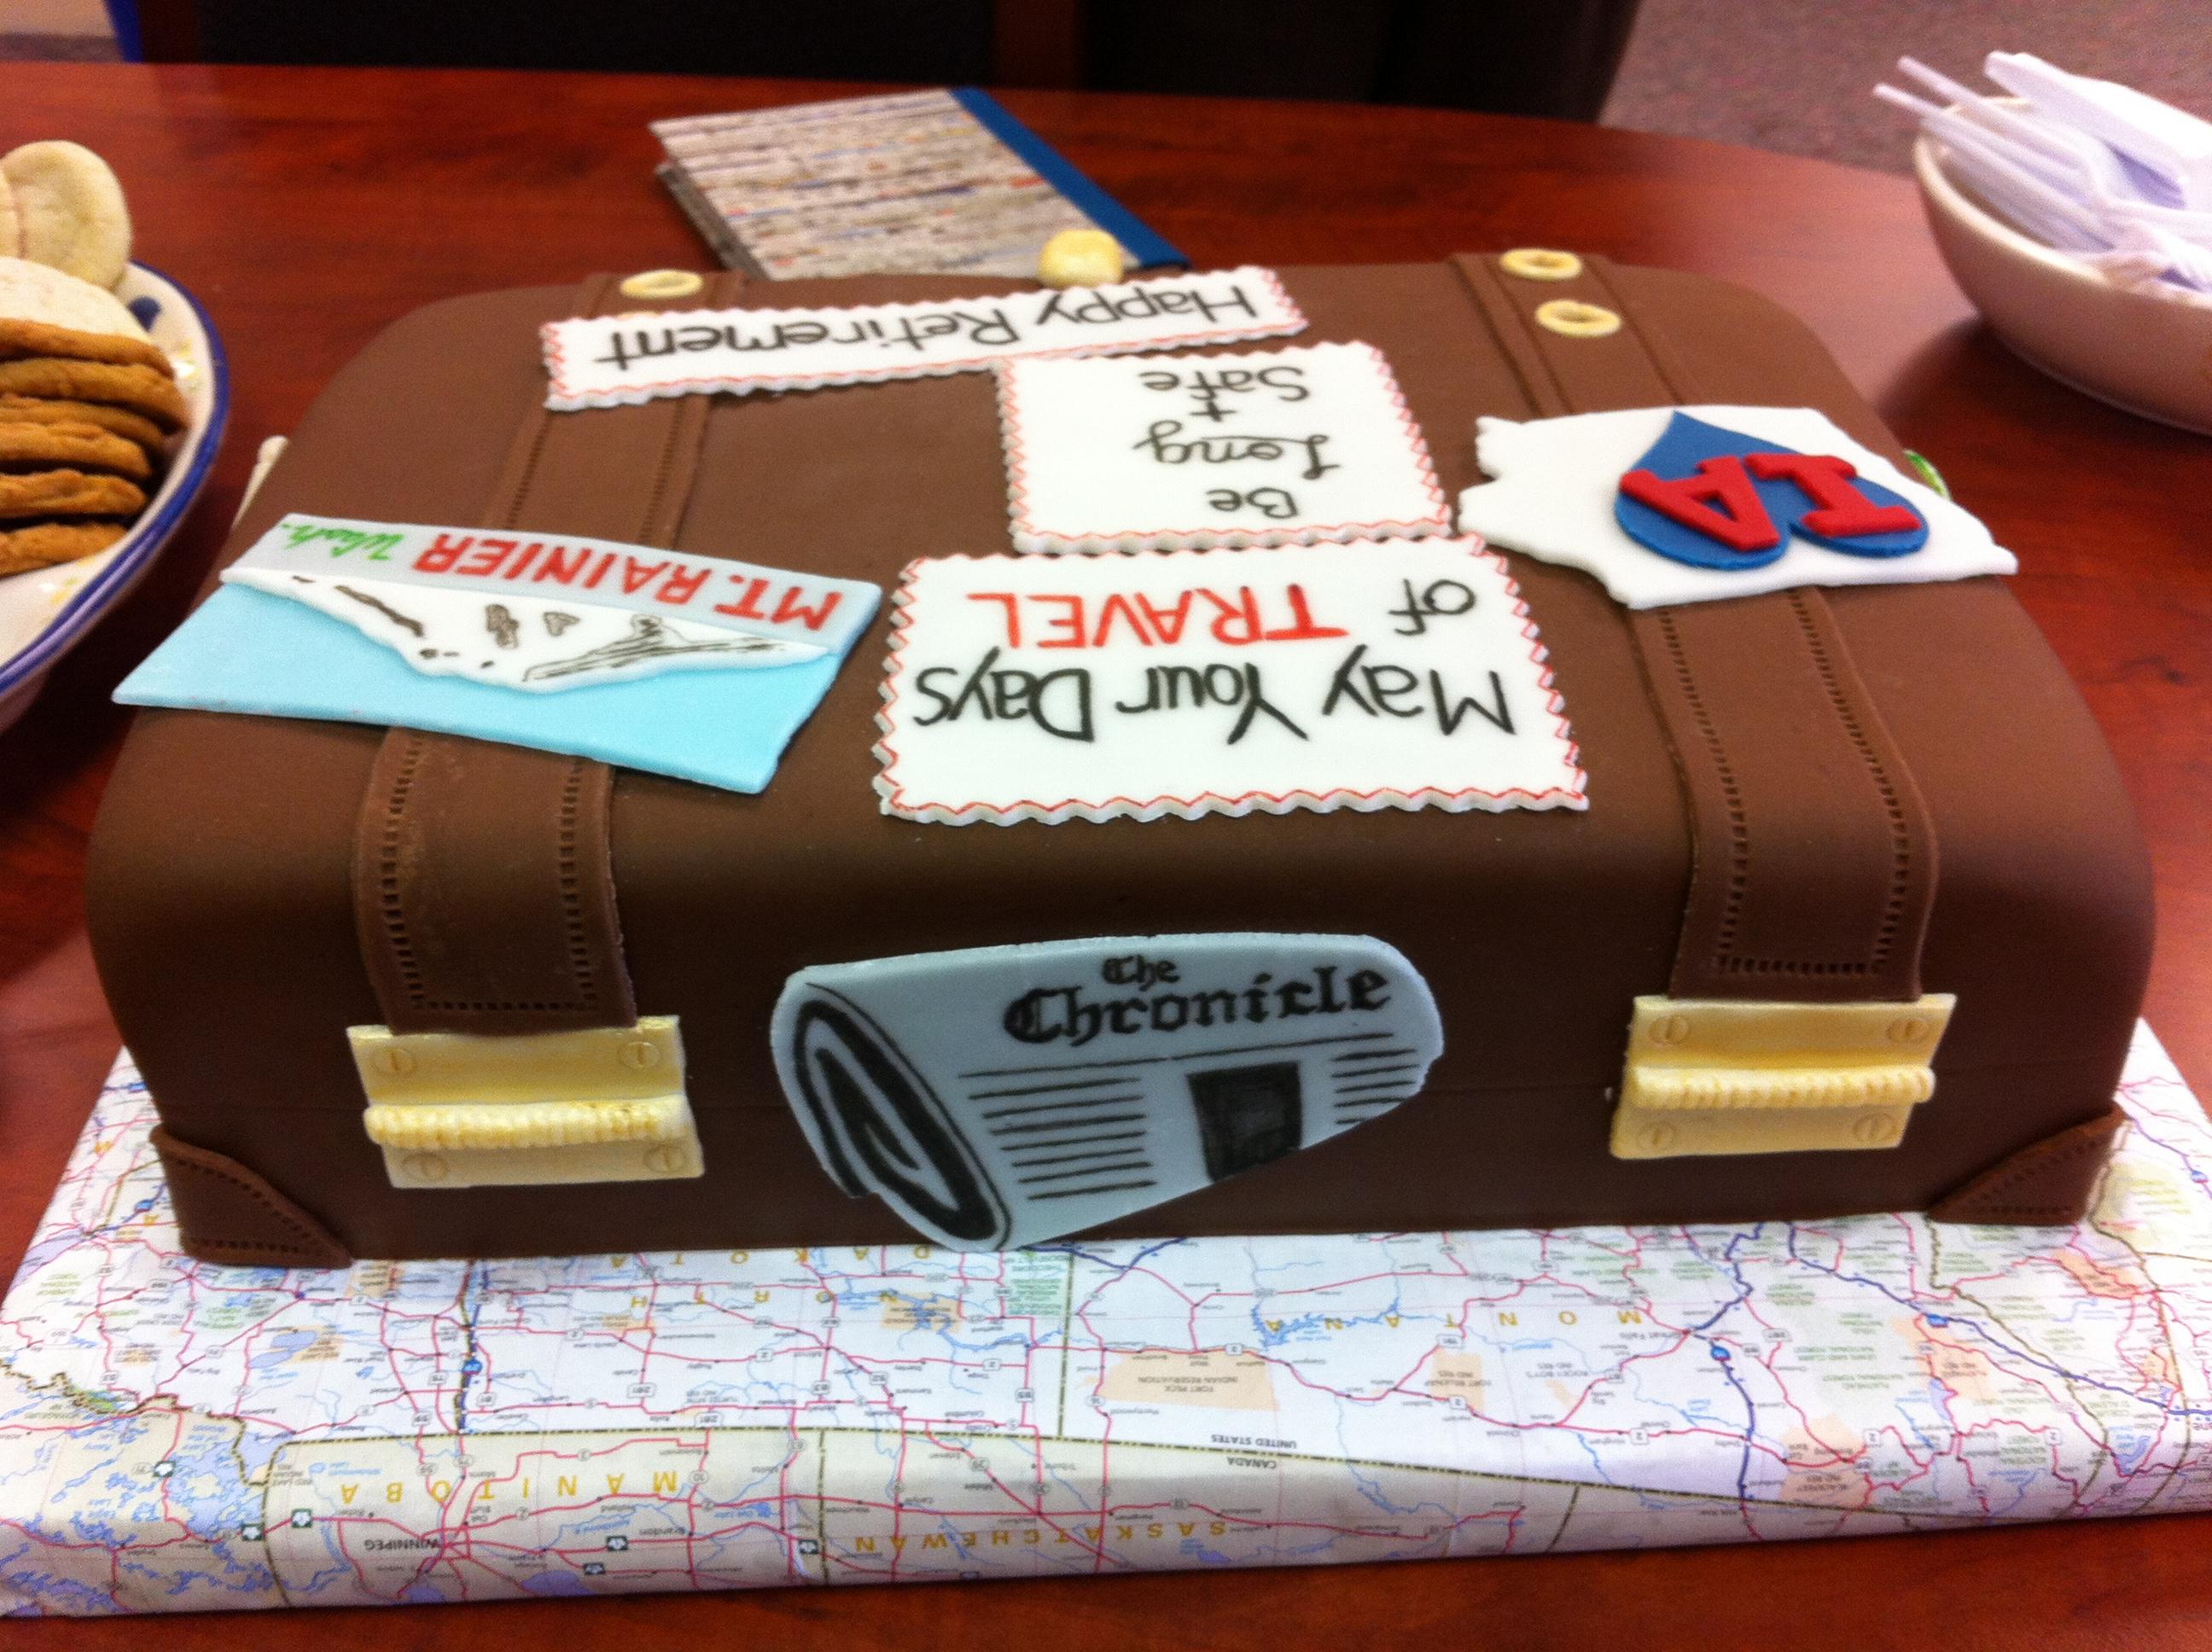 10 Happy Retirement Suitcase Cakes Photo Retirement Luggage Cake